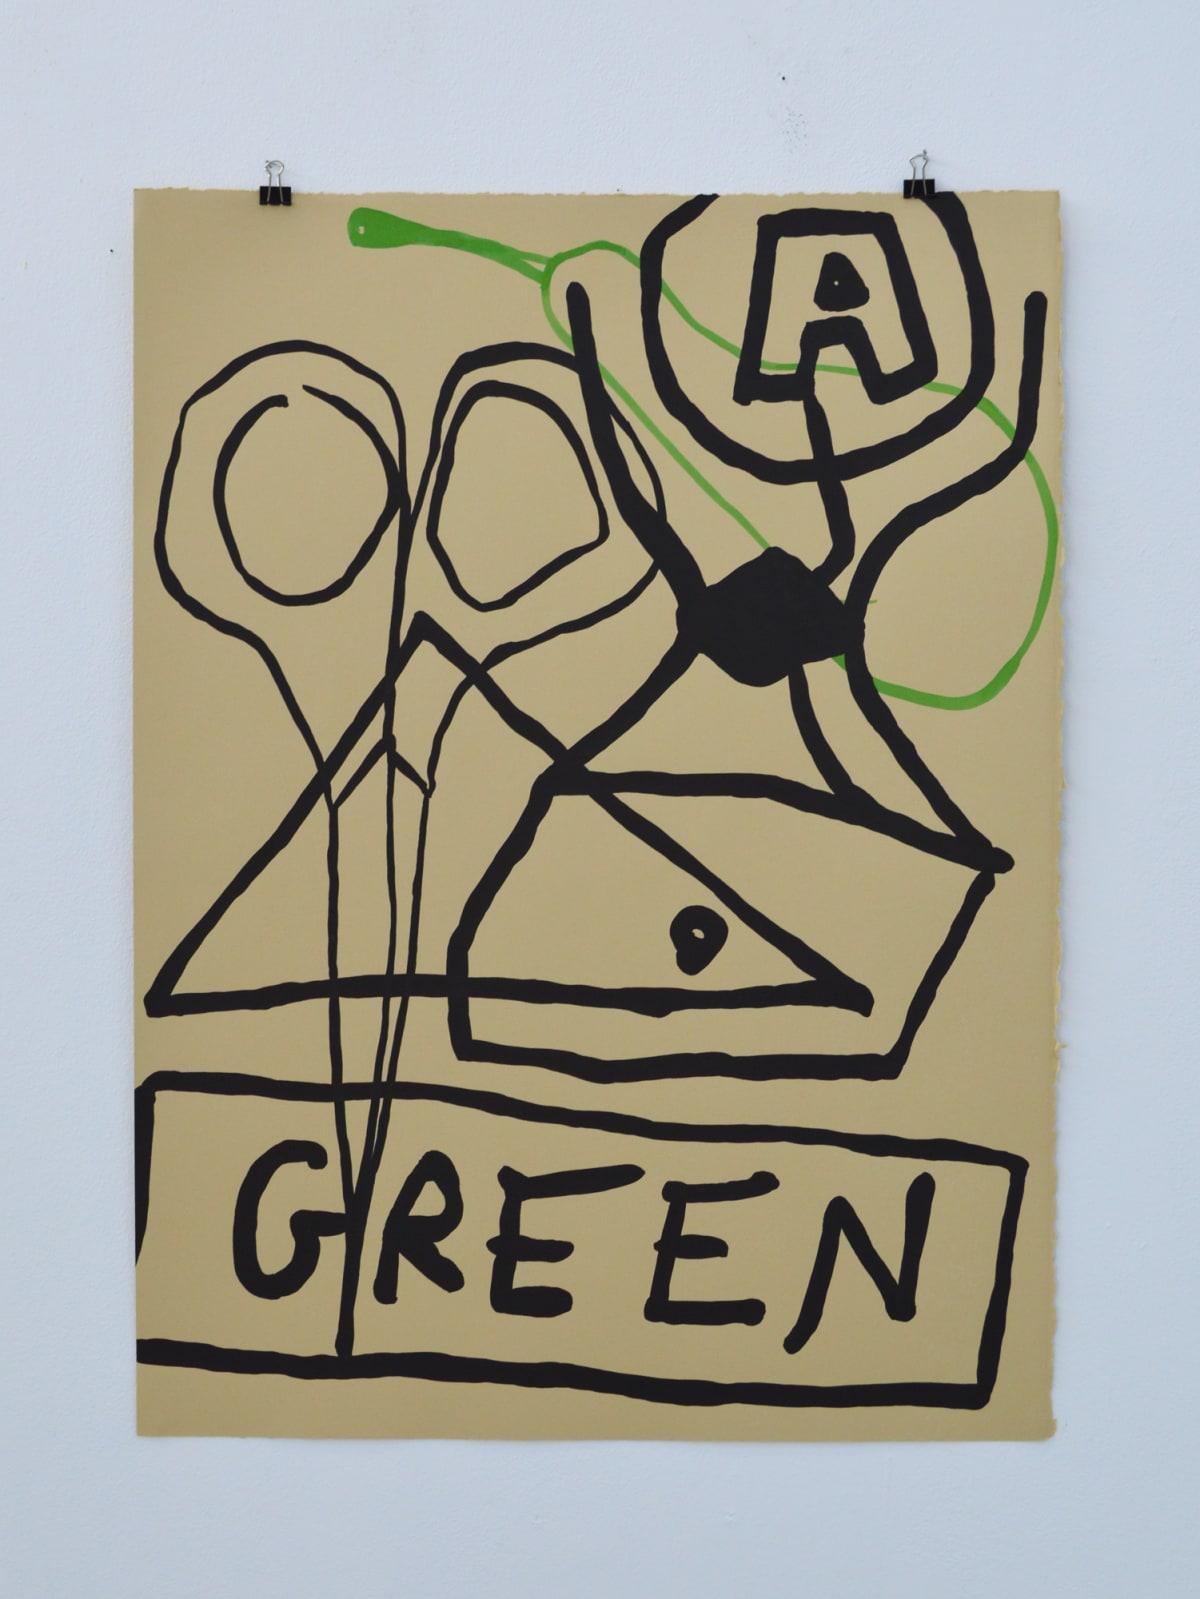 David Iain Brown, The Green Button, 2018